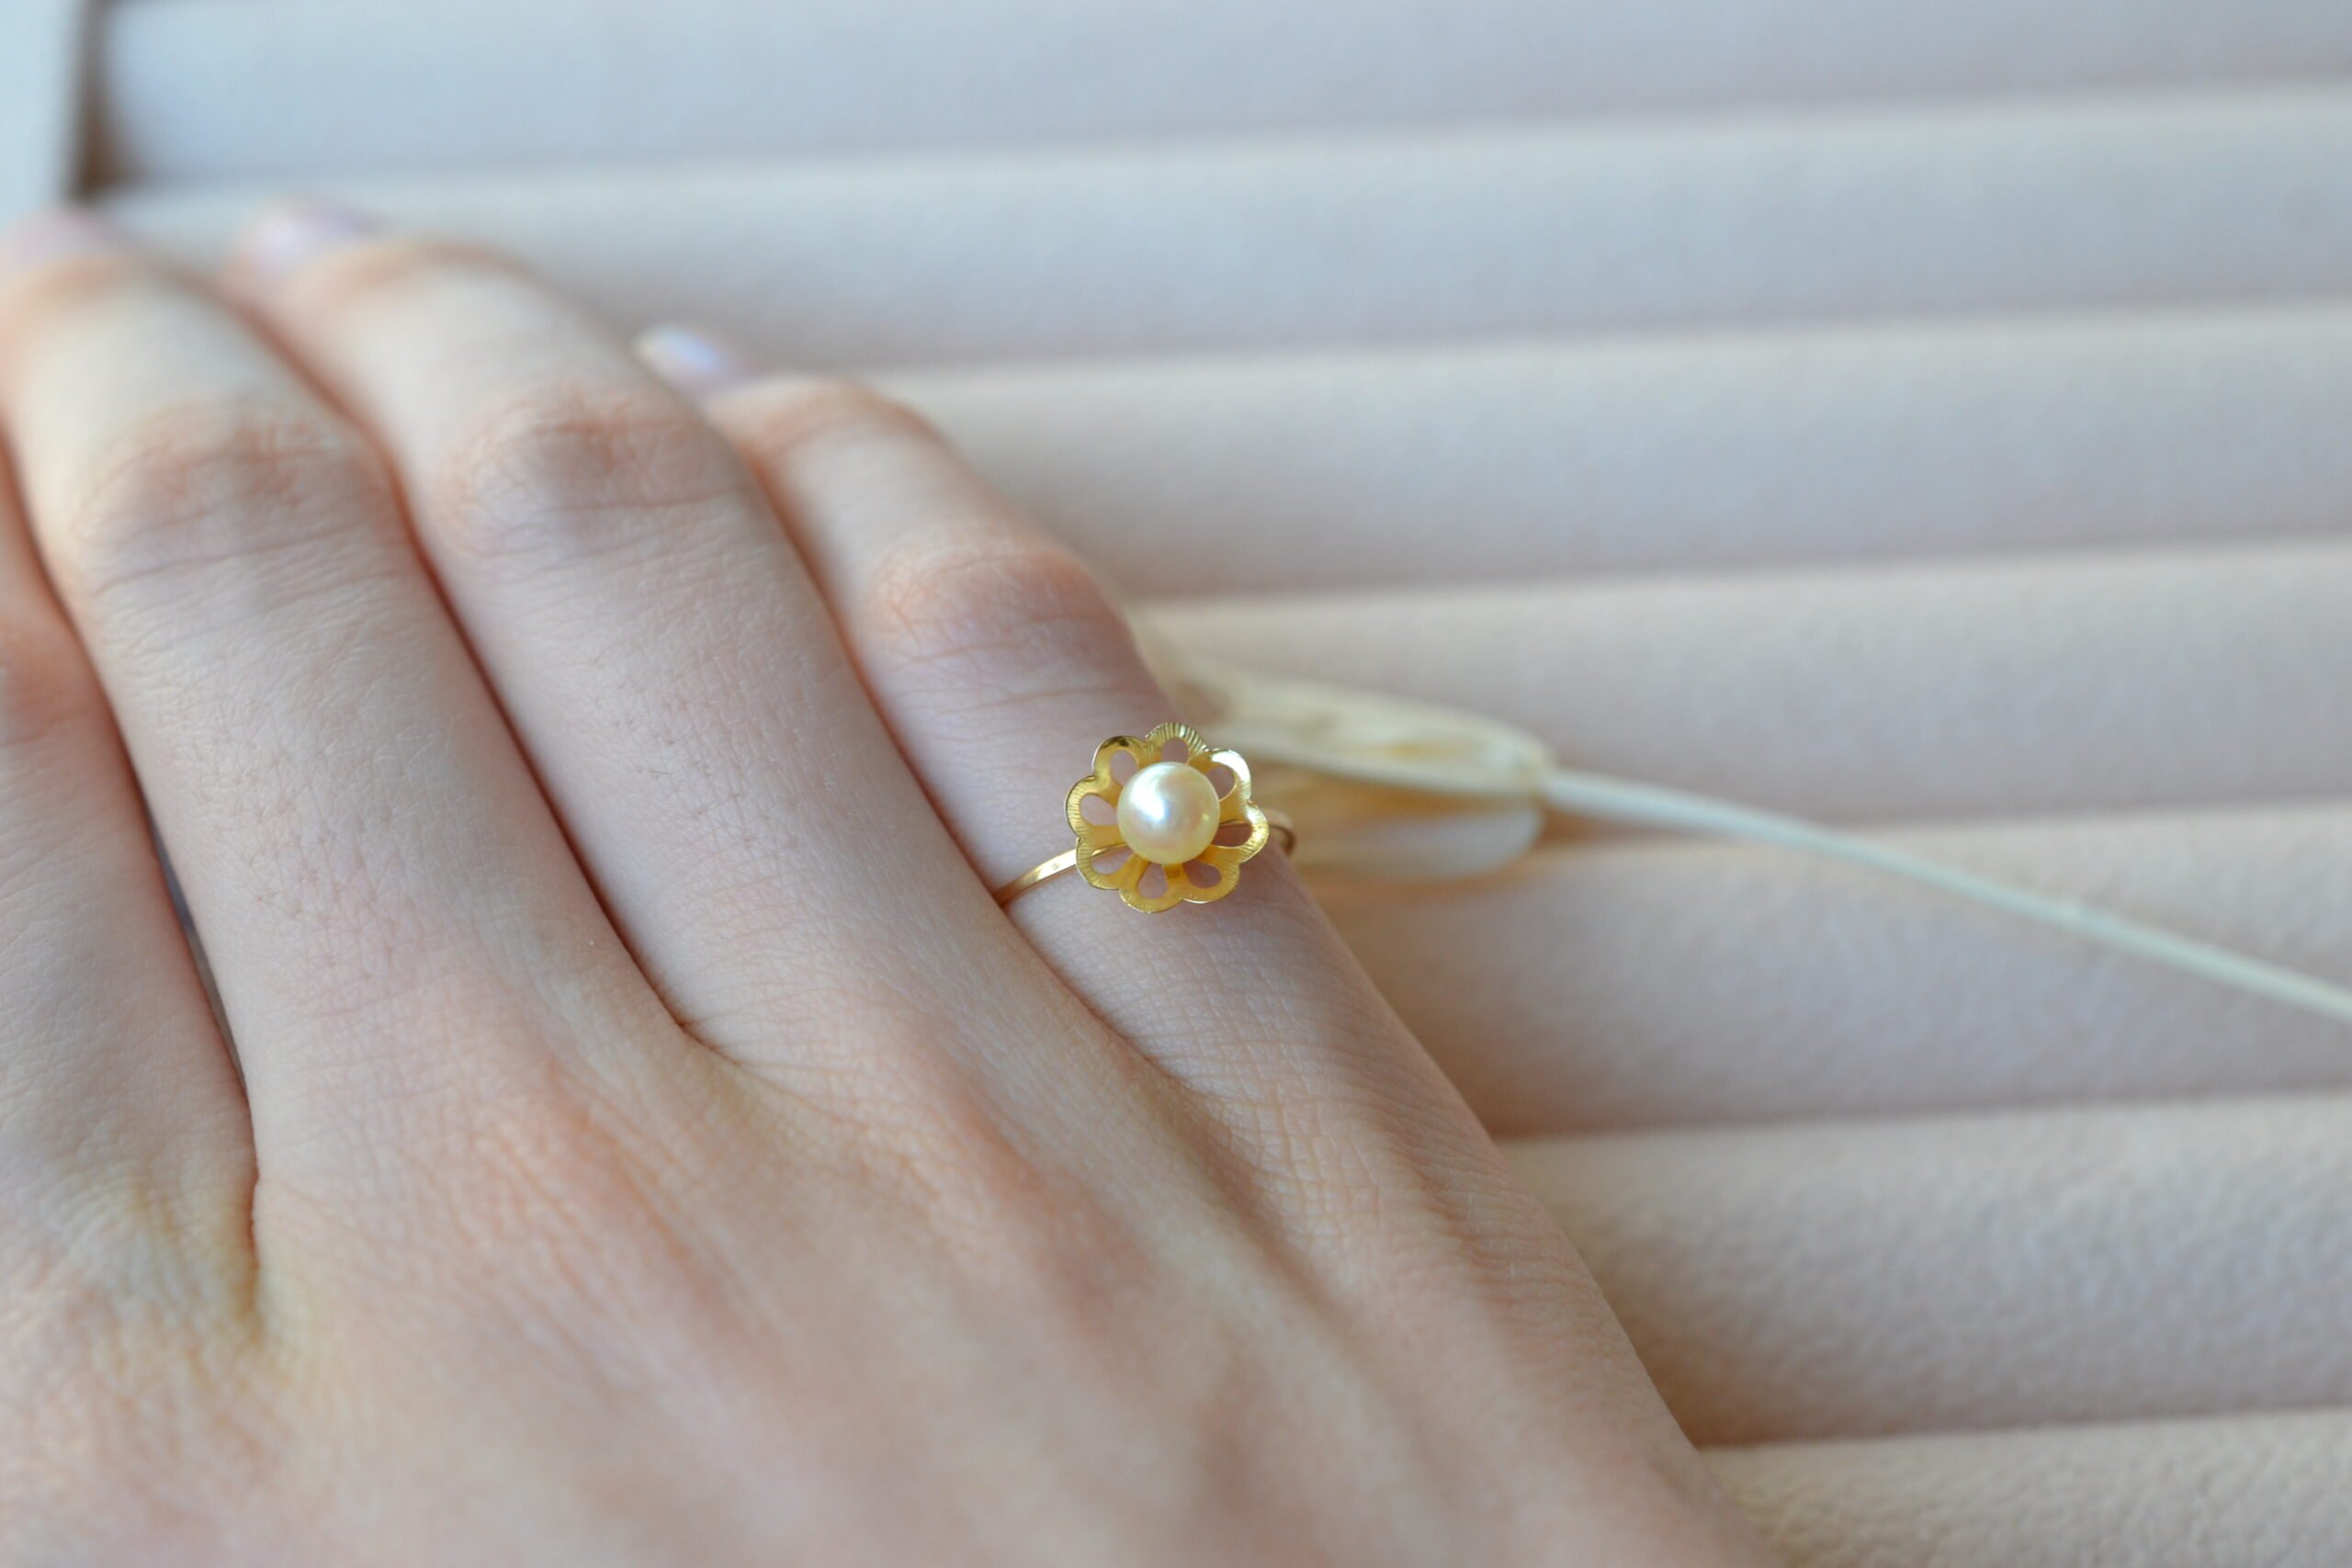 Bague monture fleur perle bijou or jaune